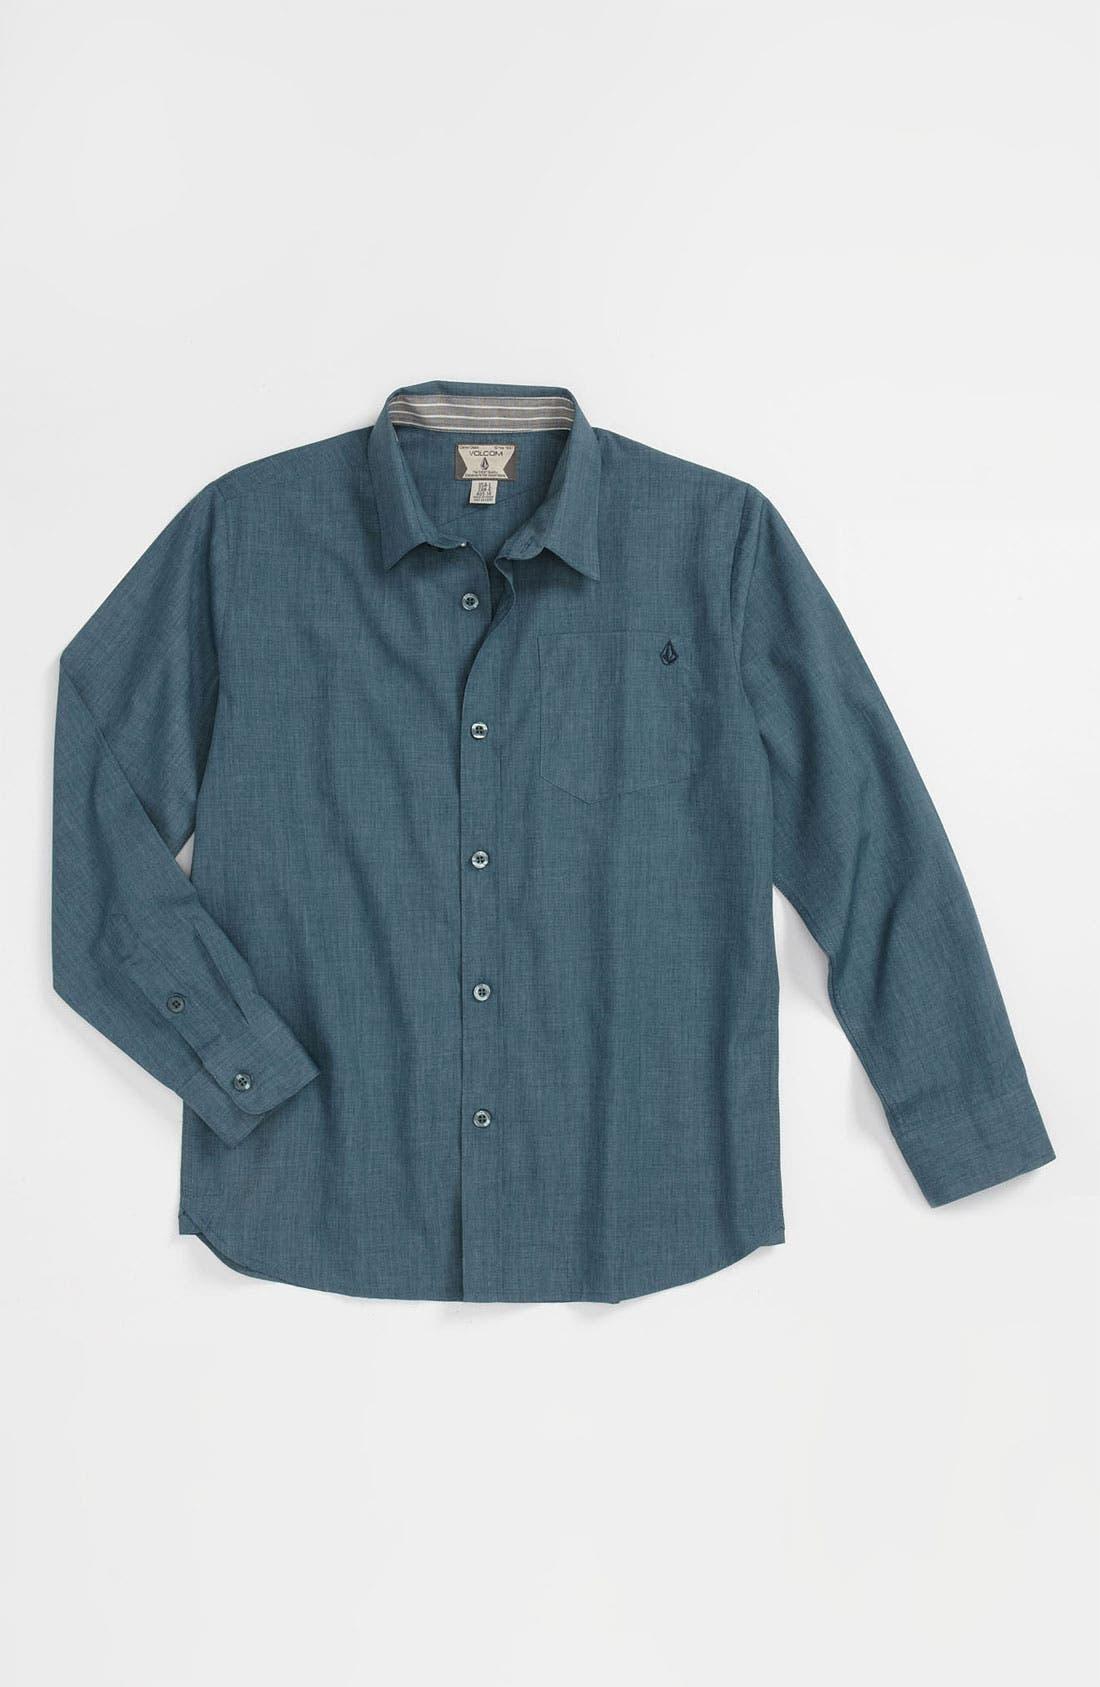 Alternate Image 1 Selected - Volcom 'Ex Factor' Woven Shirt (Big Boys)